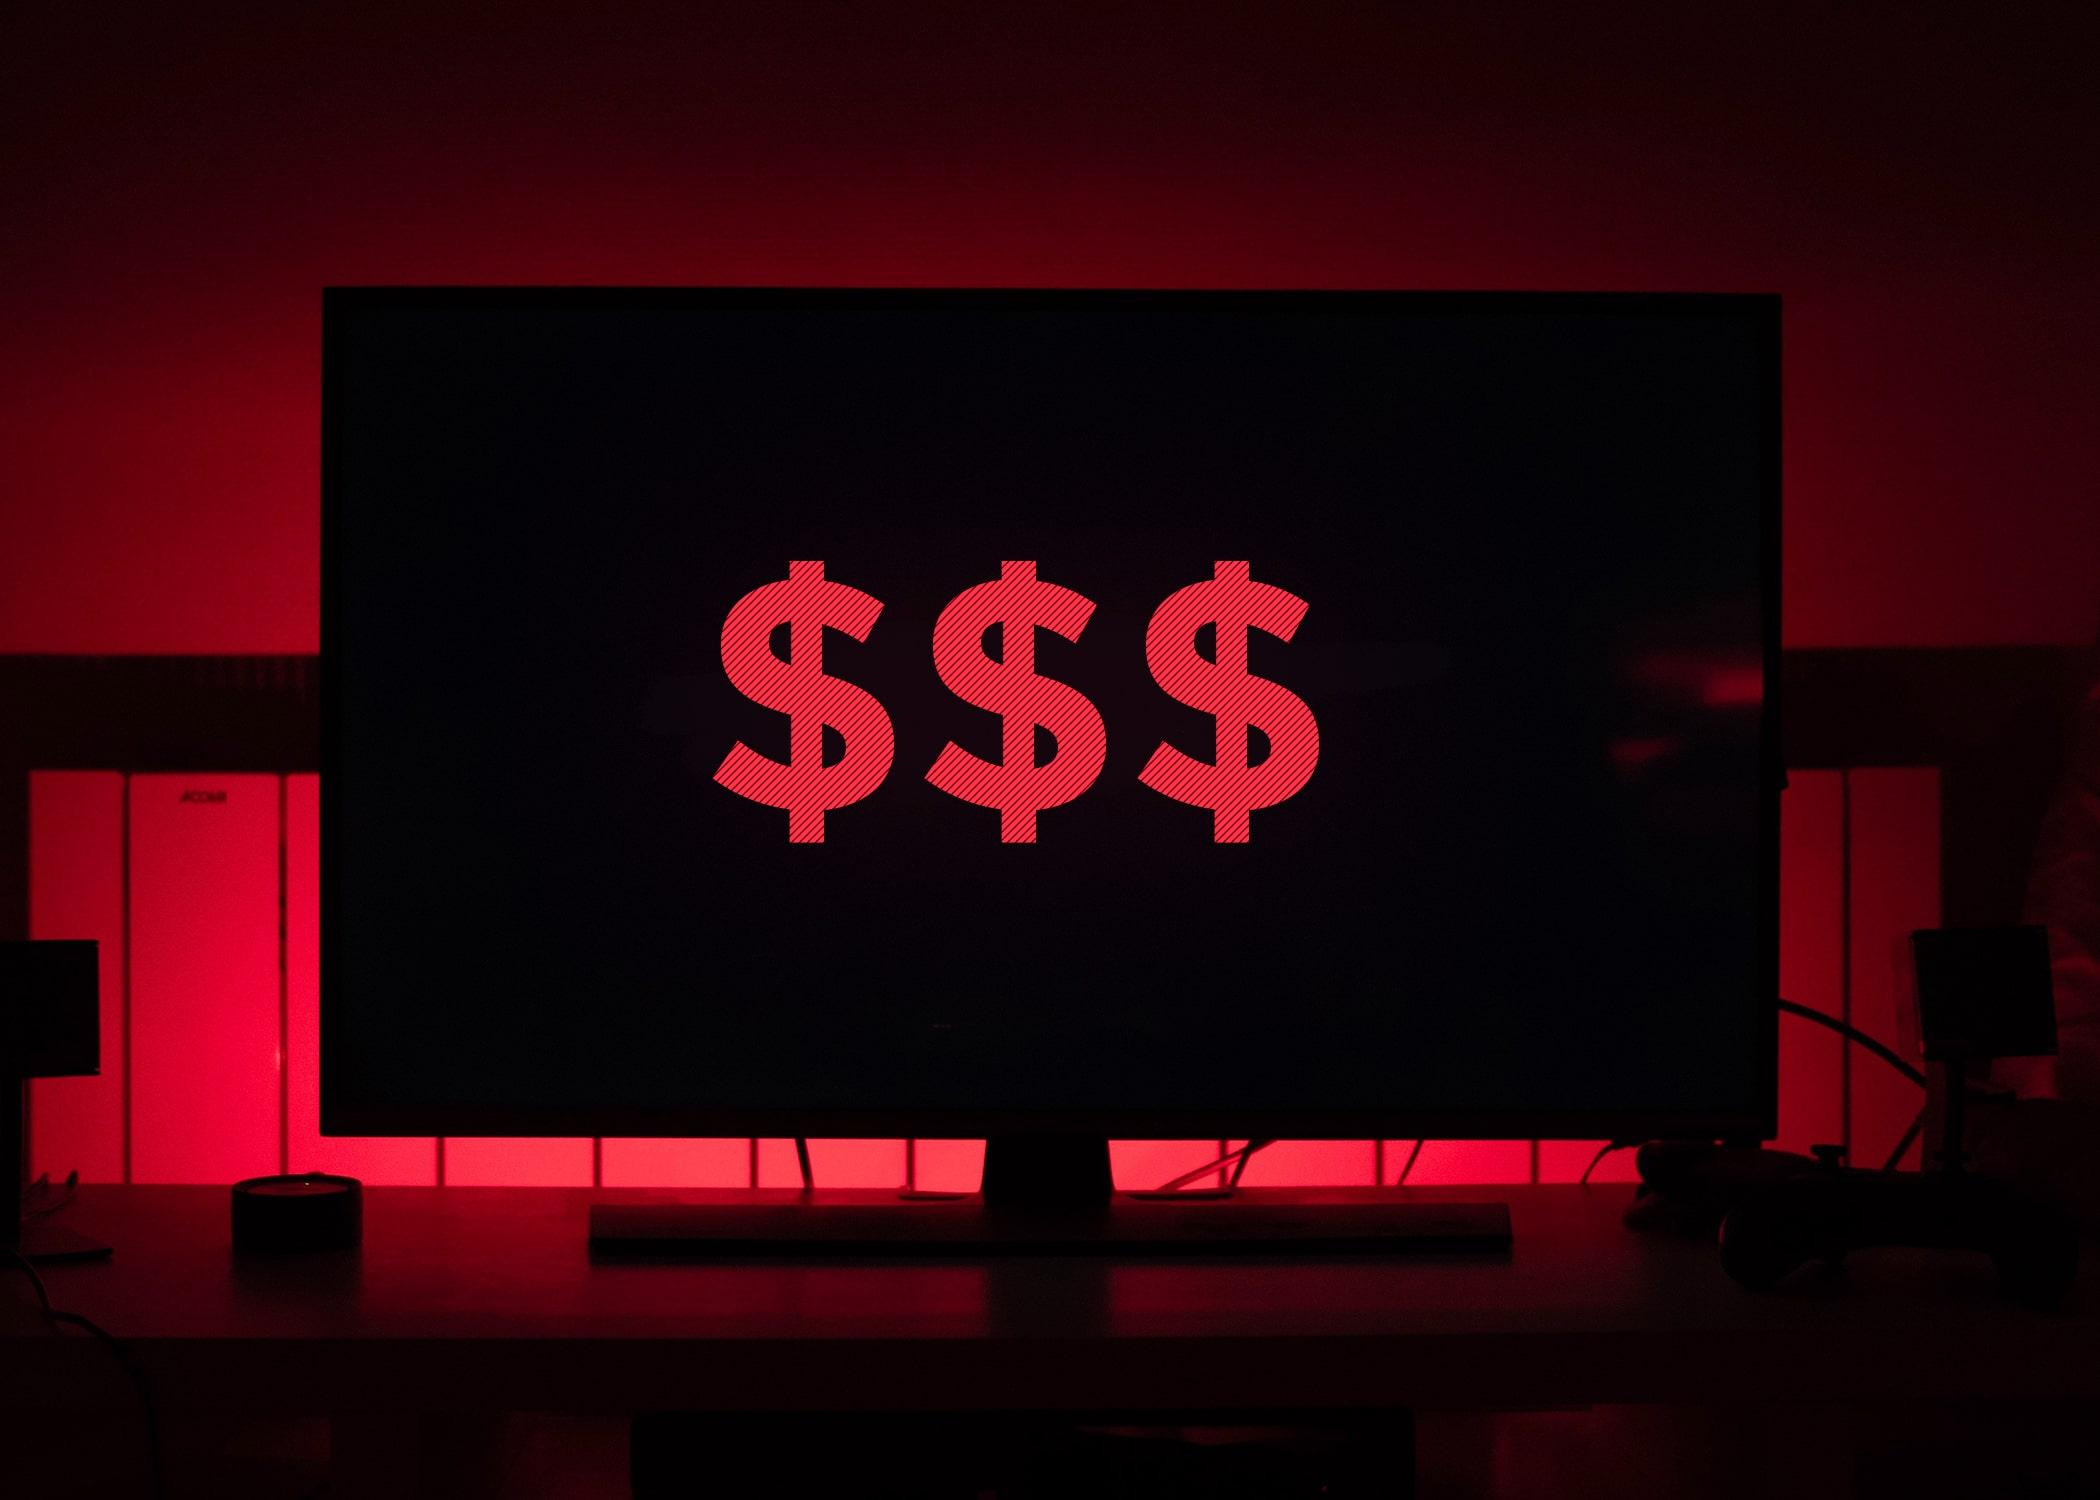 ott_money